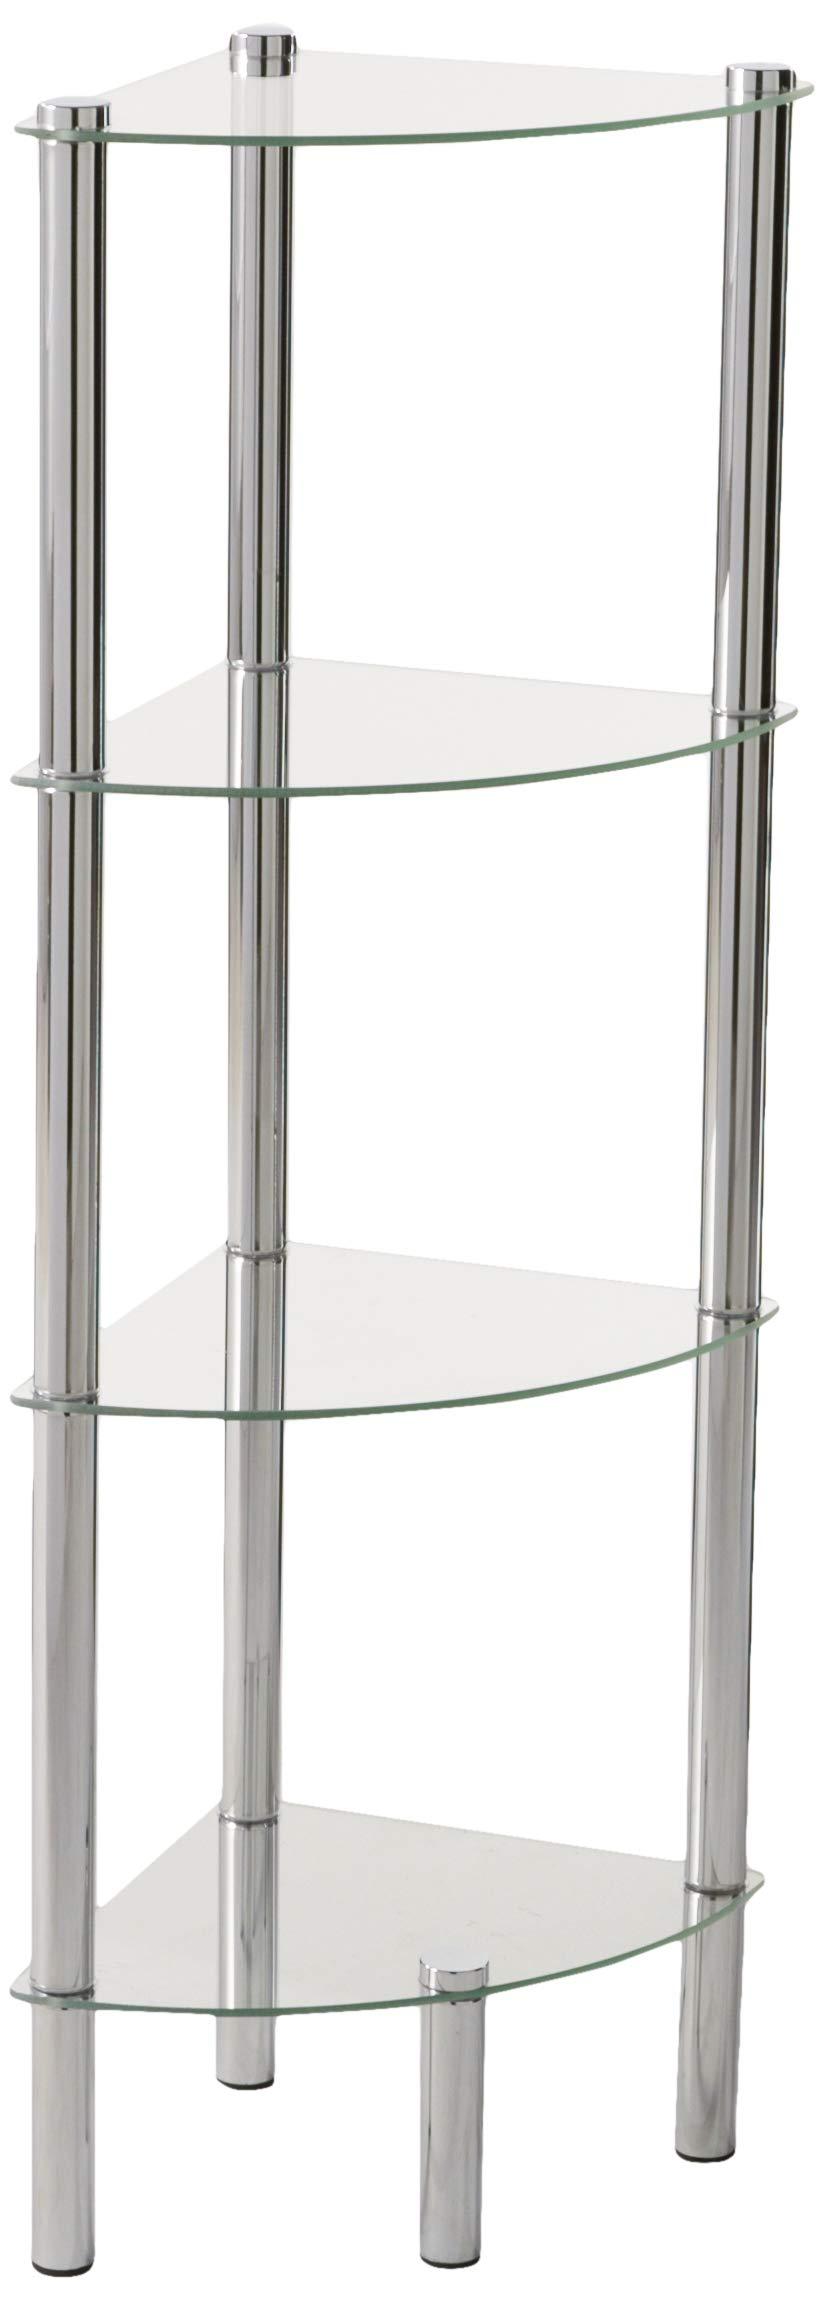 Home Basics SA10122 Shelf Corner Glass, 4-Tier by Home Basics